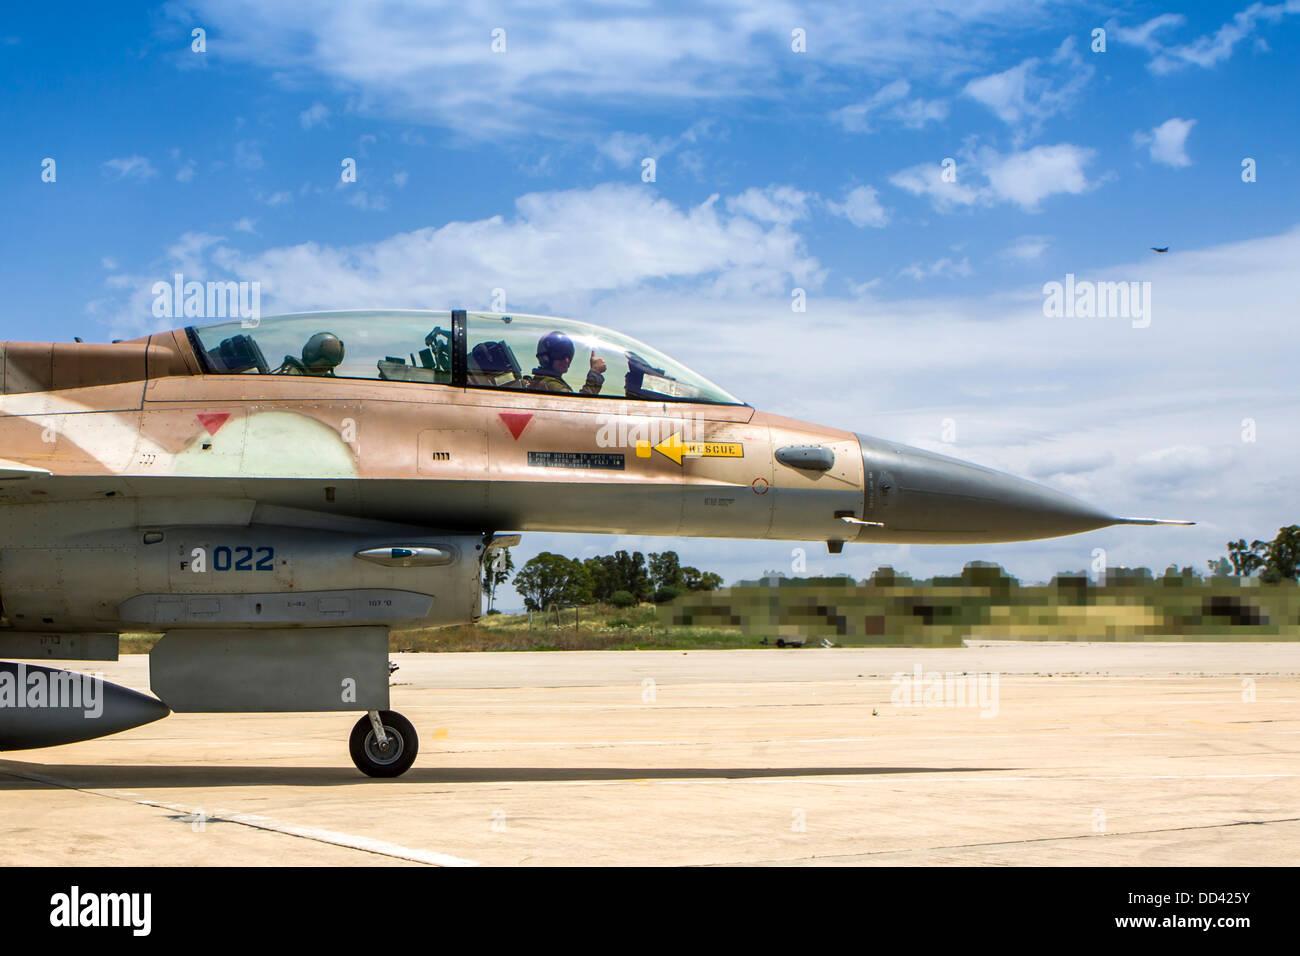 Israeli Air Force (IAF) F-16D (Barak) Fighter jet in flight - Stock Image